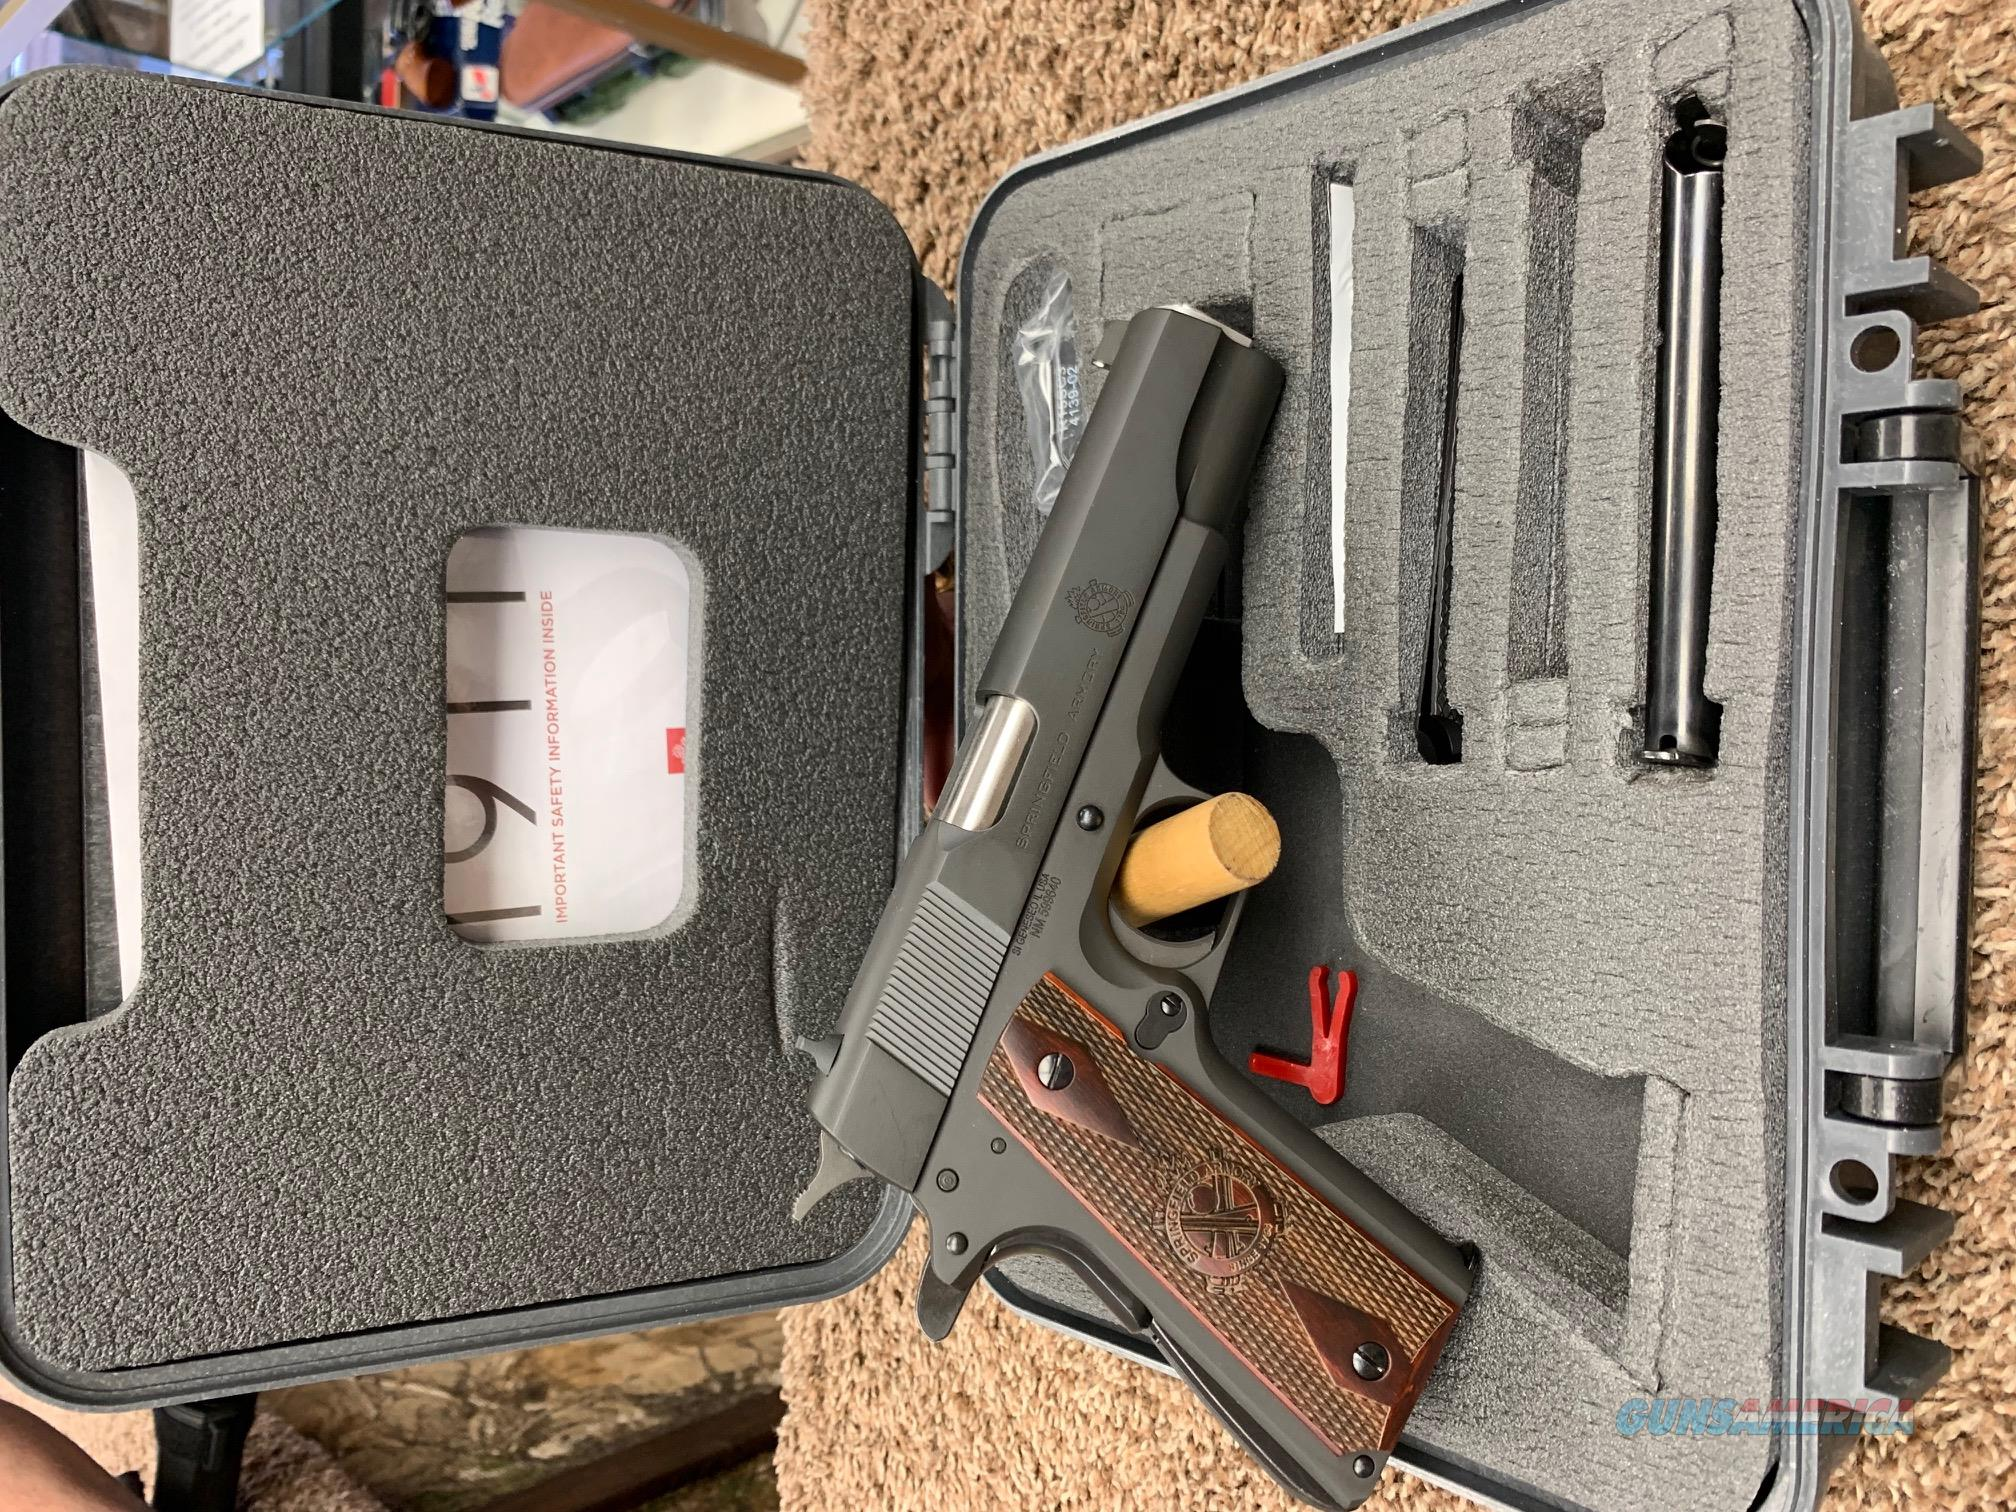 PB9109L Springfield 1911 45 ACP  Guns > Pistols > Springfield Armory Pistols > 1911 Type